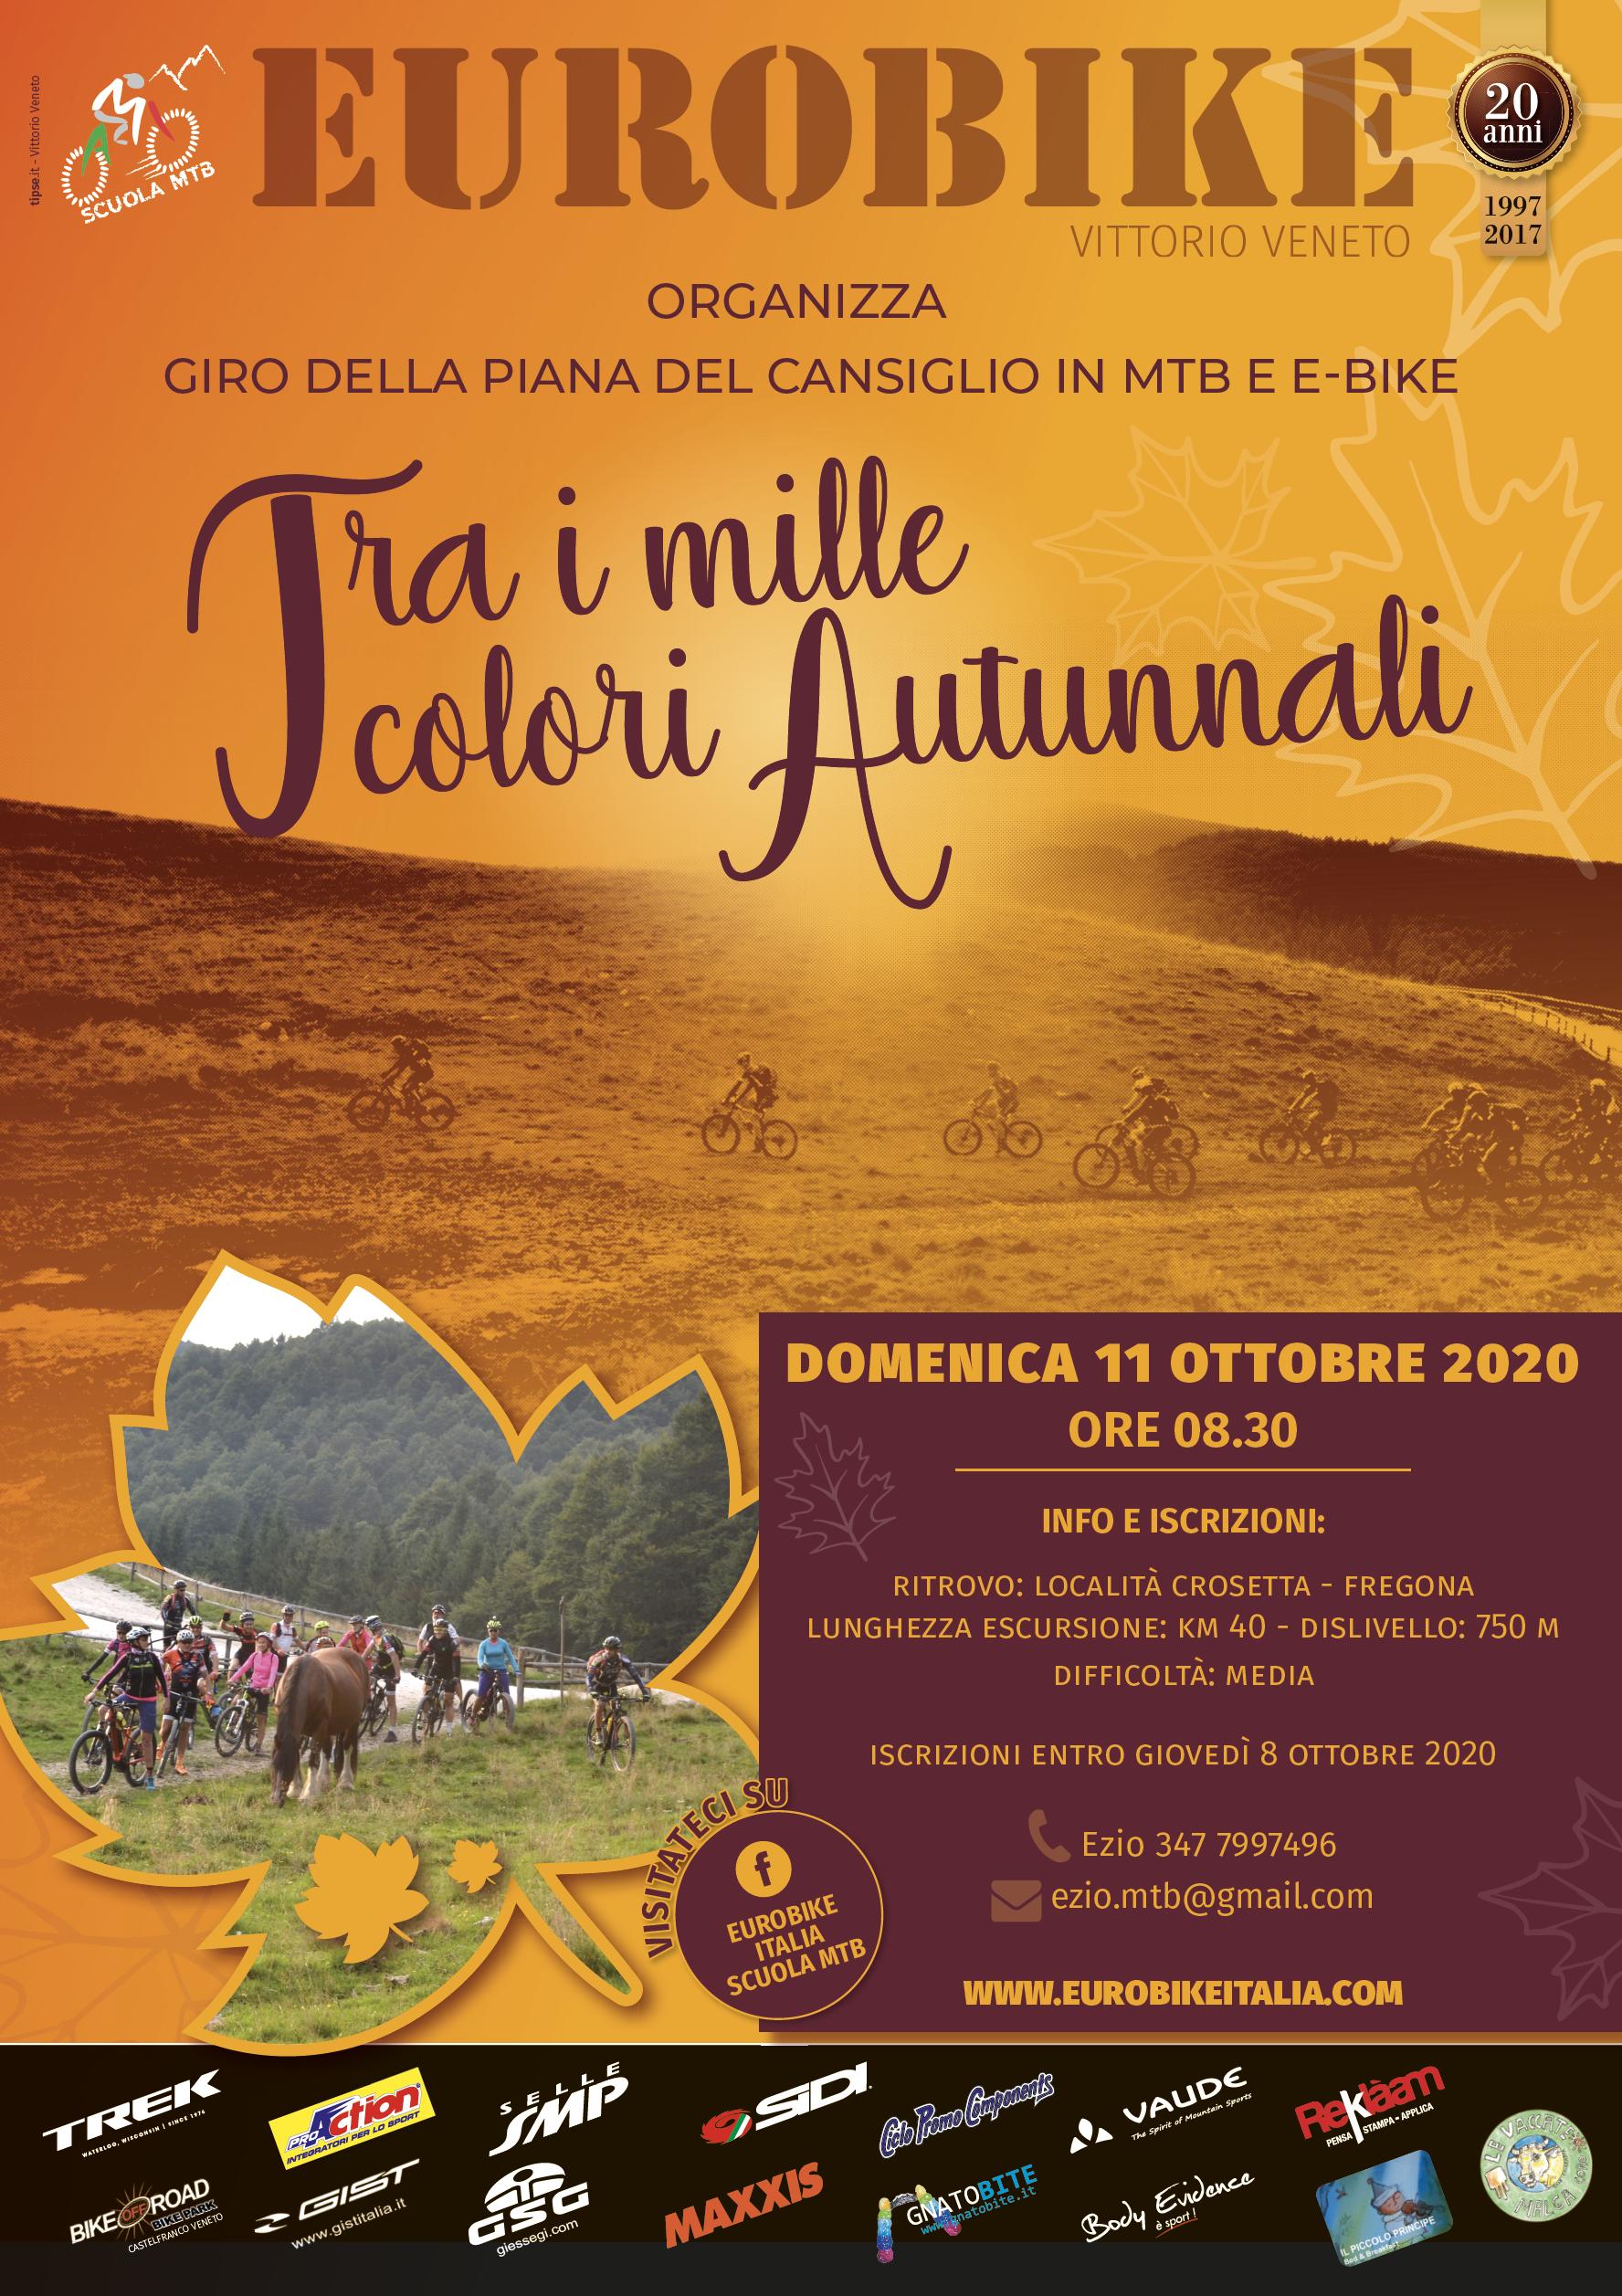 11.10.2020 Eurobike in Cansiglio